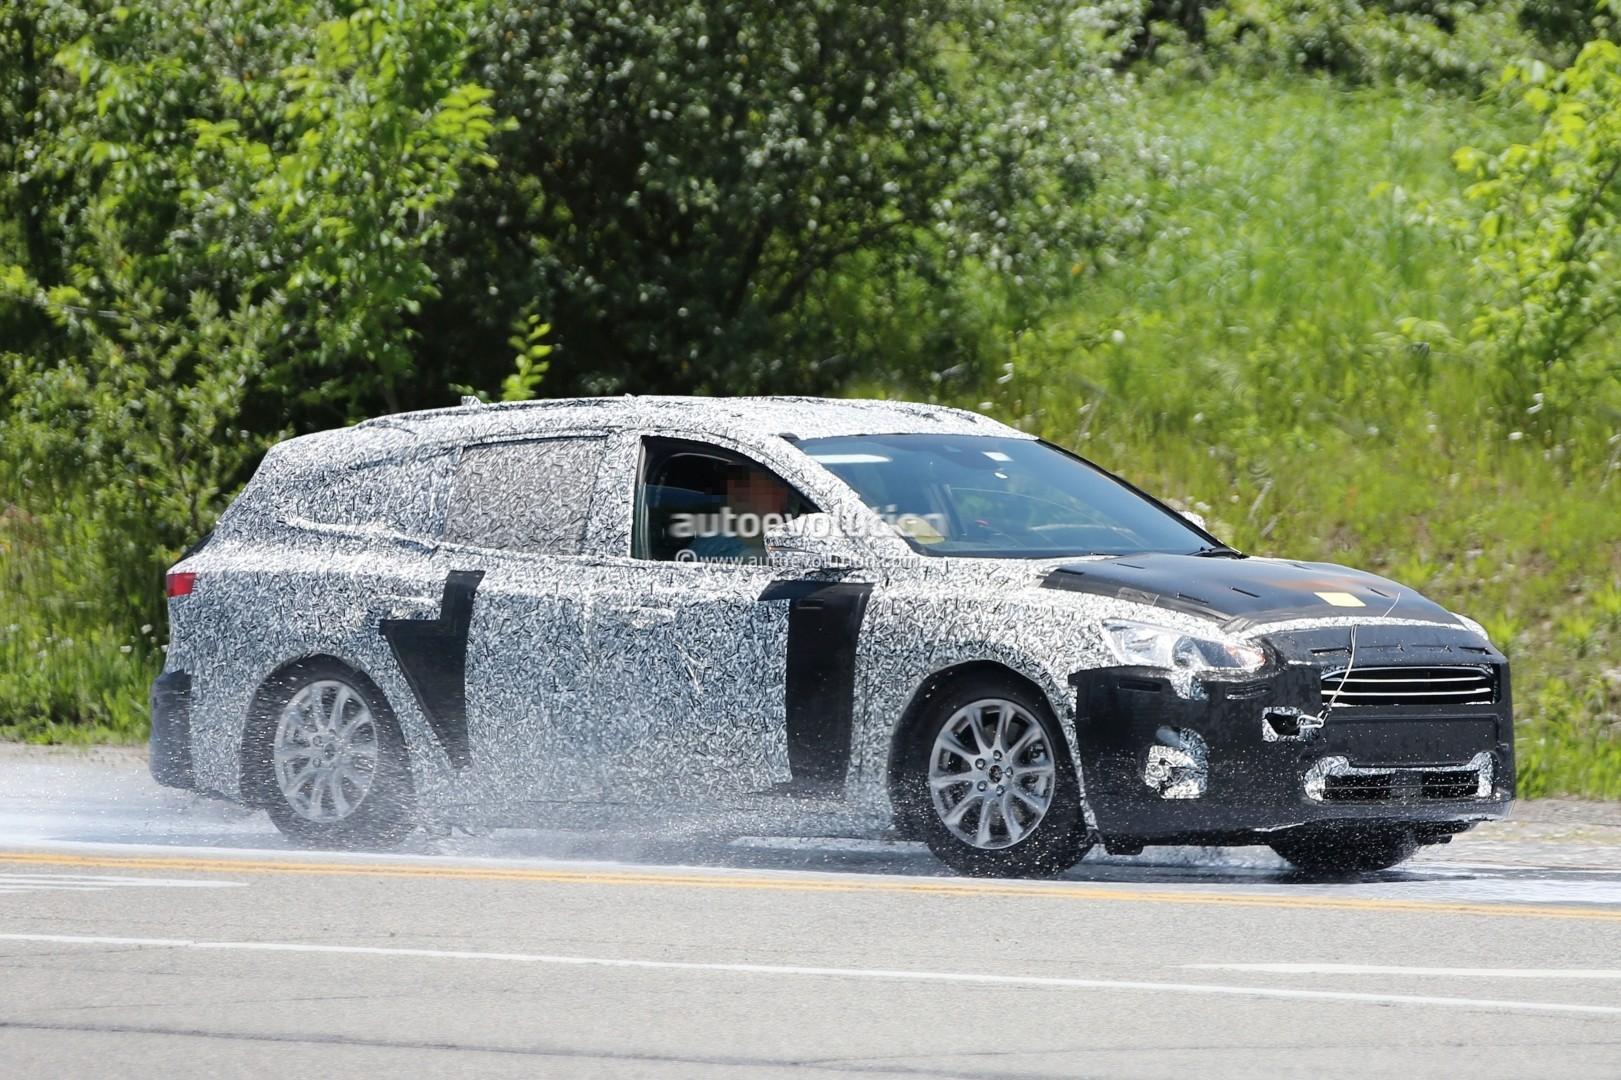 spyshots-2019-ford-focus-wagon-prototype-reveals-longer-rear-doors_3